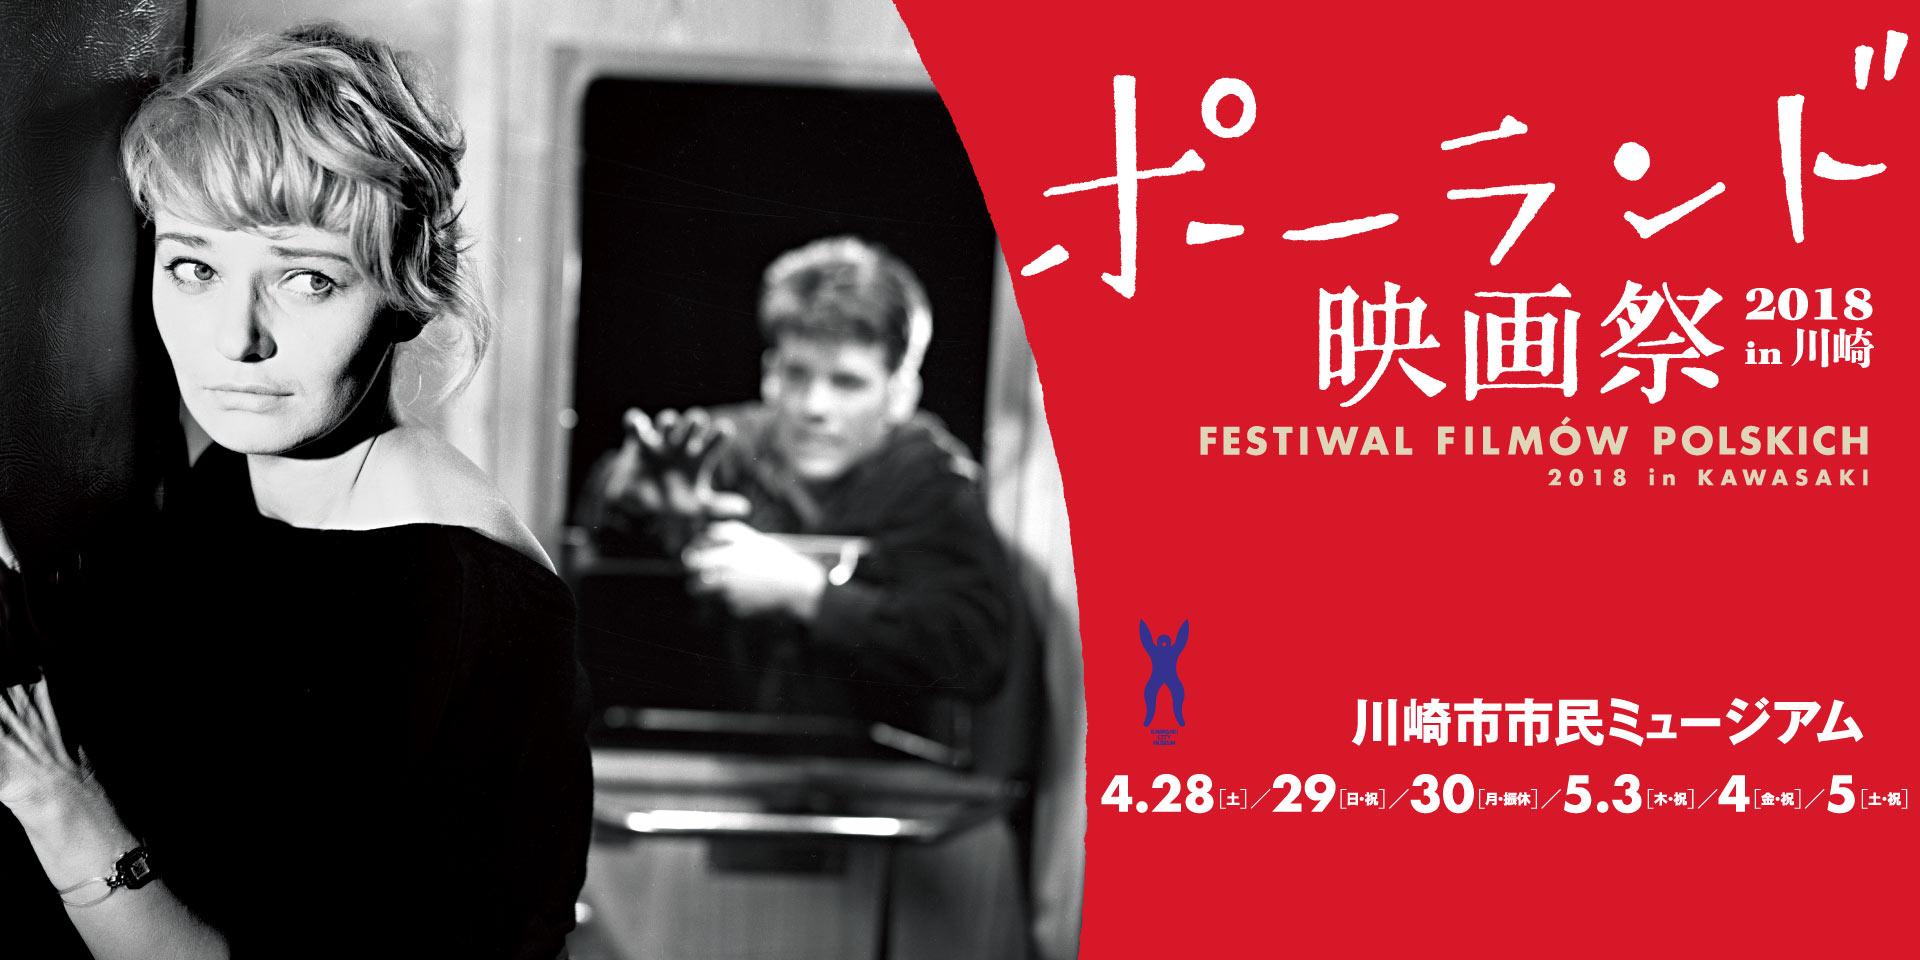 ポーランド映画祭2018 in 川崎 ~中井精也 鉄道写真展連携上映~